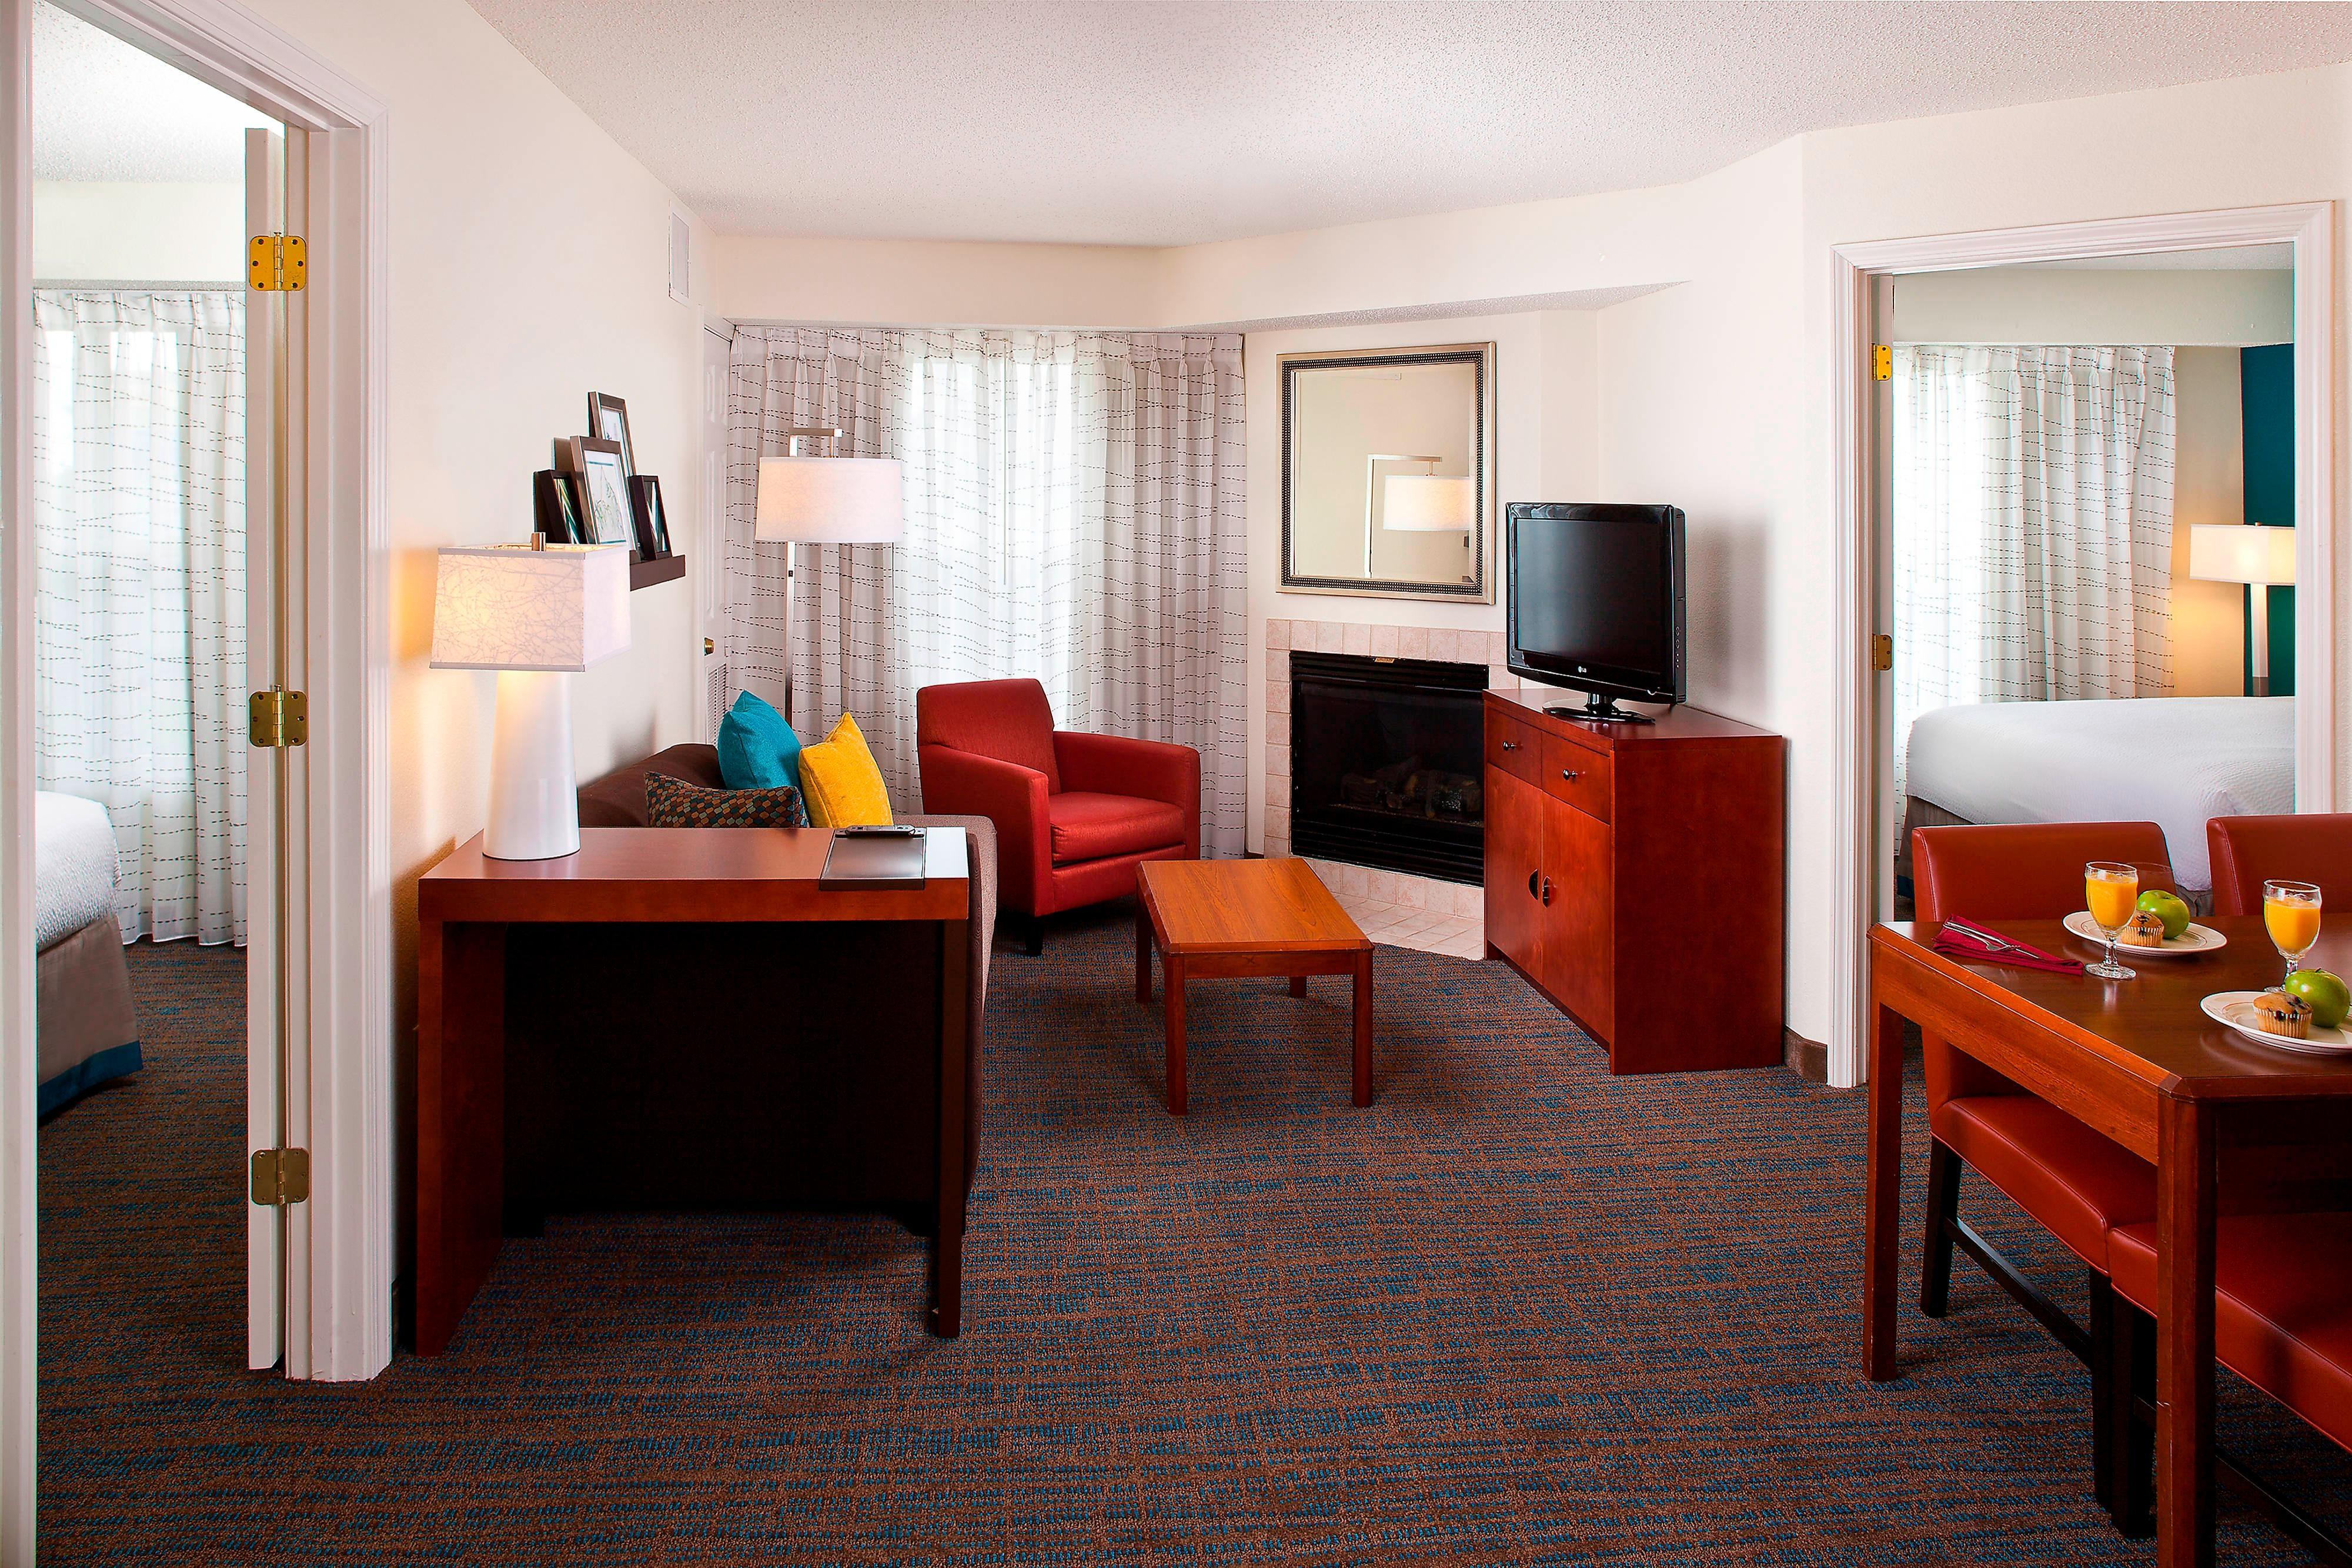 louisiana apartments in oakbrook bedroom baton la rouge